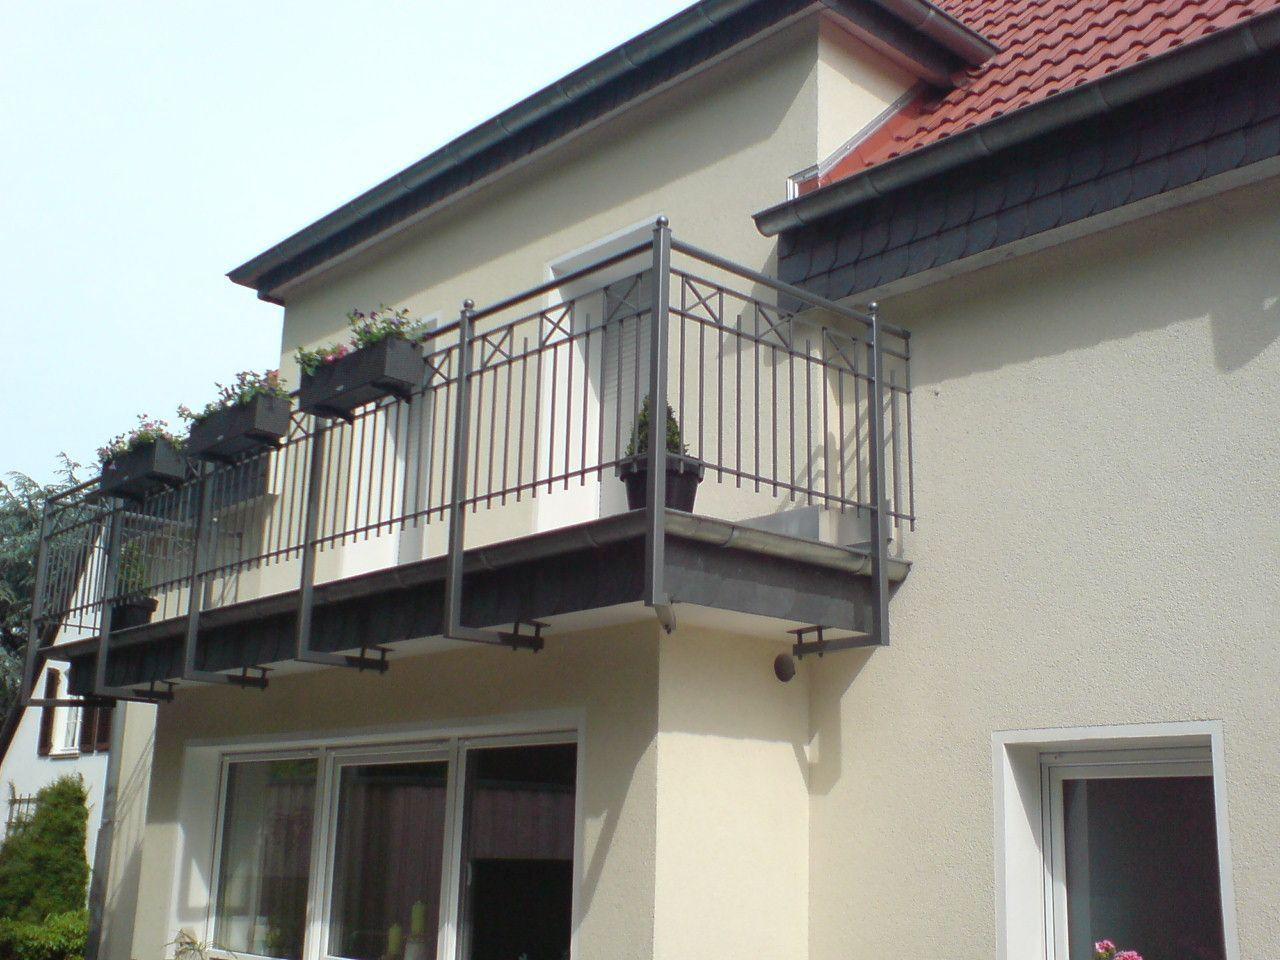 balkongel nder wartung instandhaltung brandschutzt ren. Black Bedroom Furniture Sets. Home Design Ideas